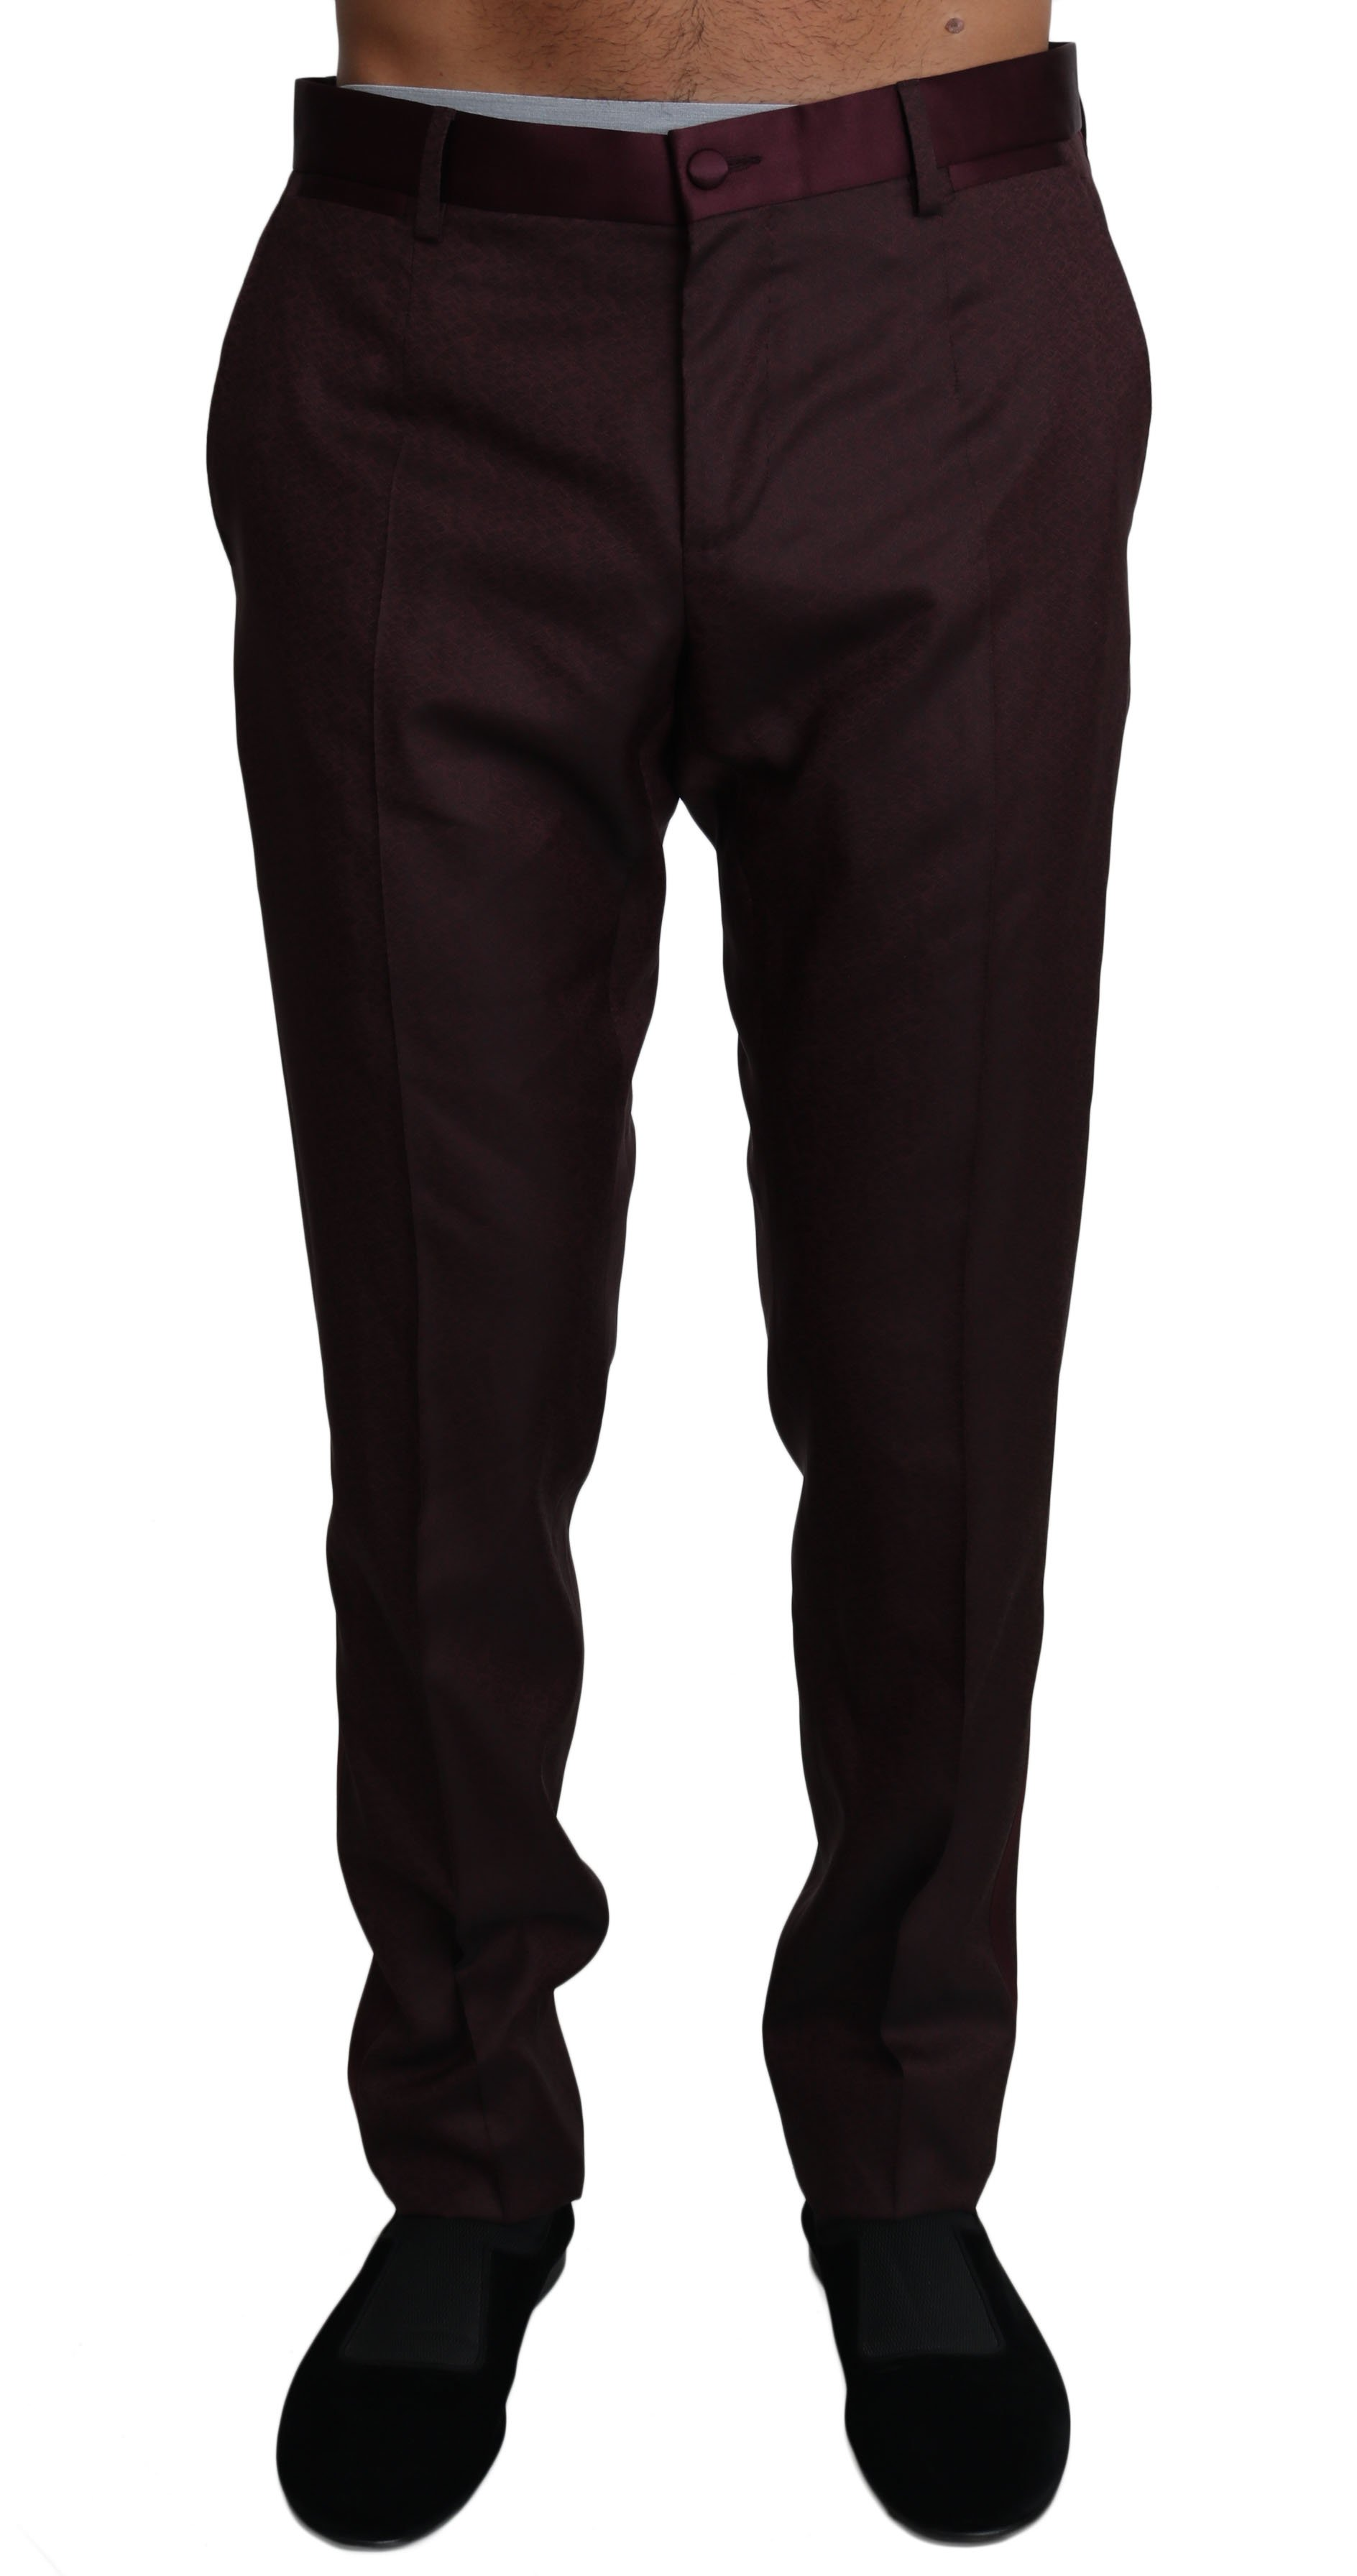 Dolce & Gabbana Men's Wool Pattern Stripe Trousers Bordeaux PAN61136 - IT52 | XL